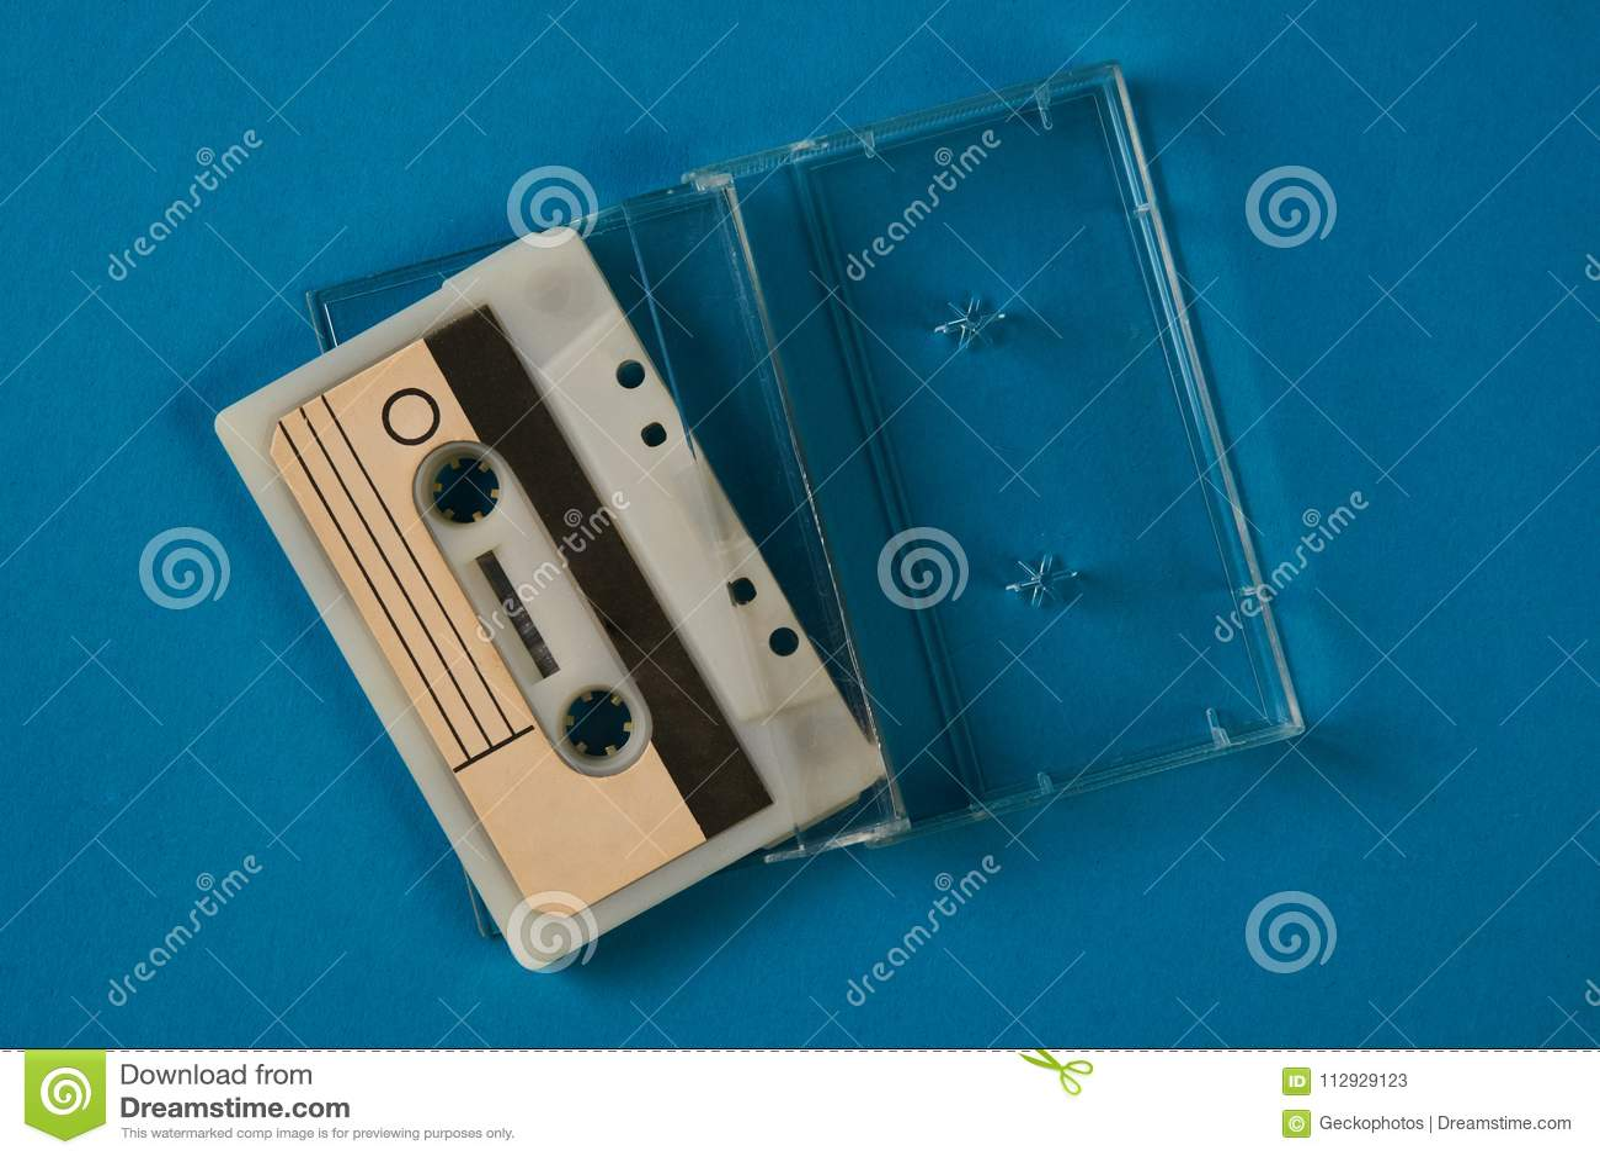 Blank Cassette Tape Box With Retro Cassette On Blue